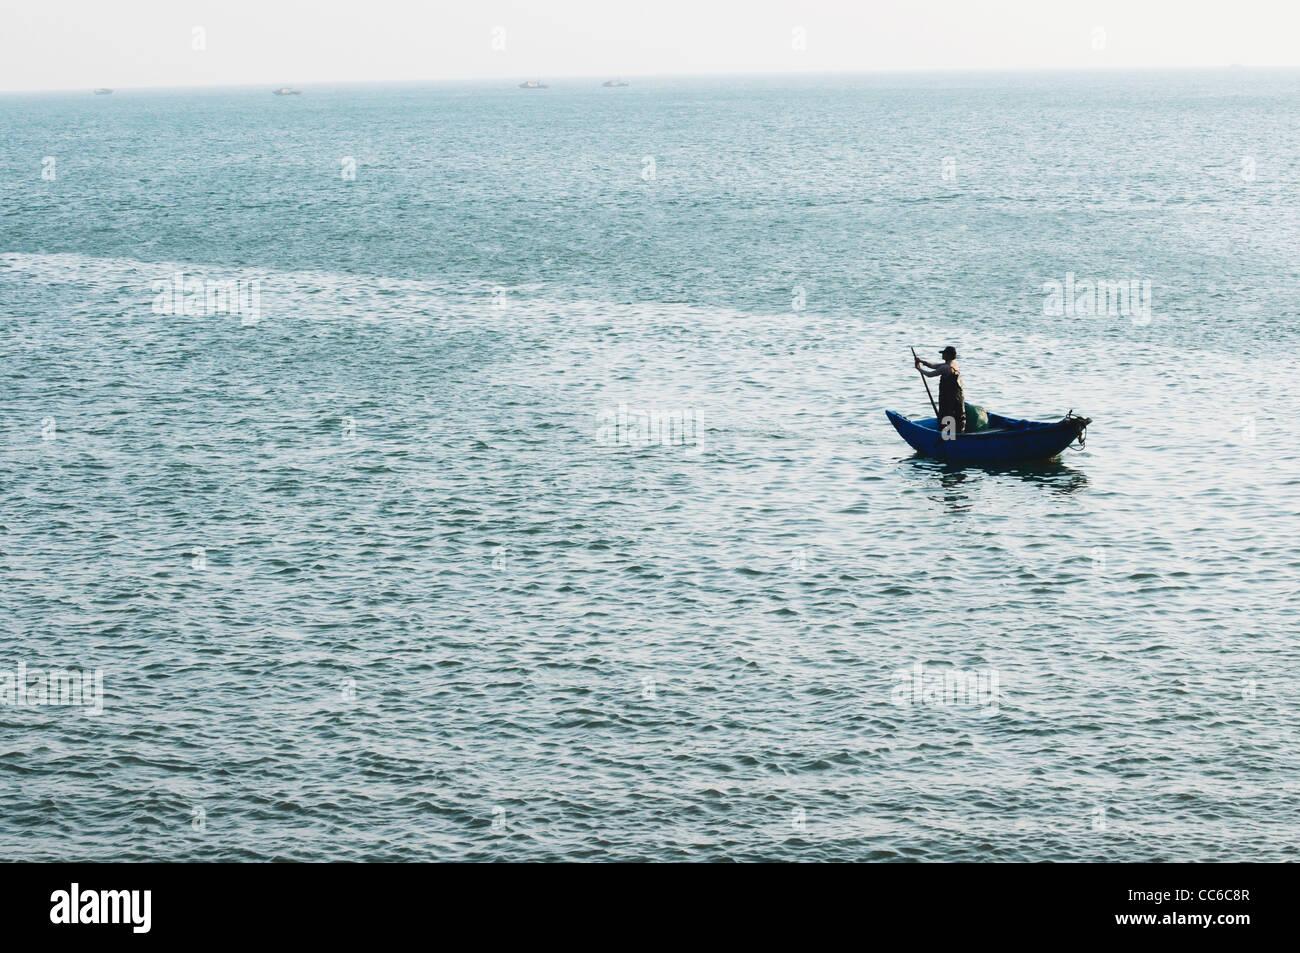 Man fishing on the South China Sea, Beihai, Guangxi , China - Stock Image